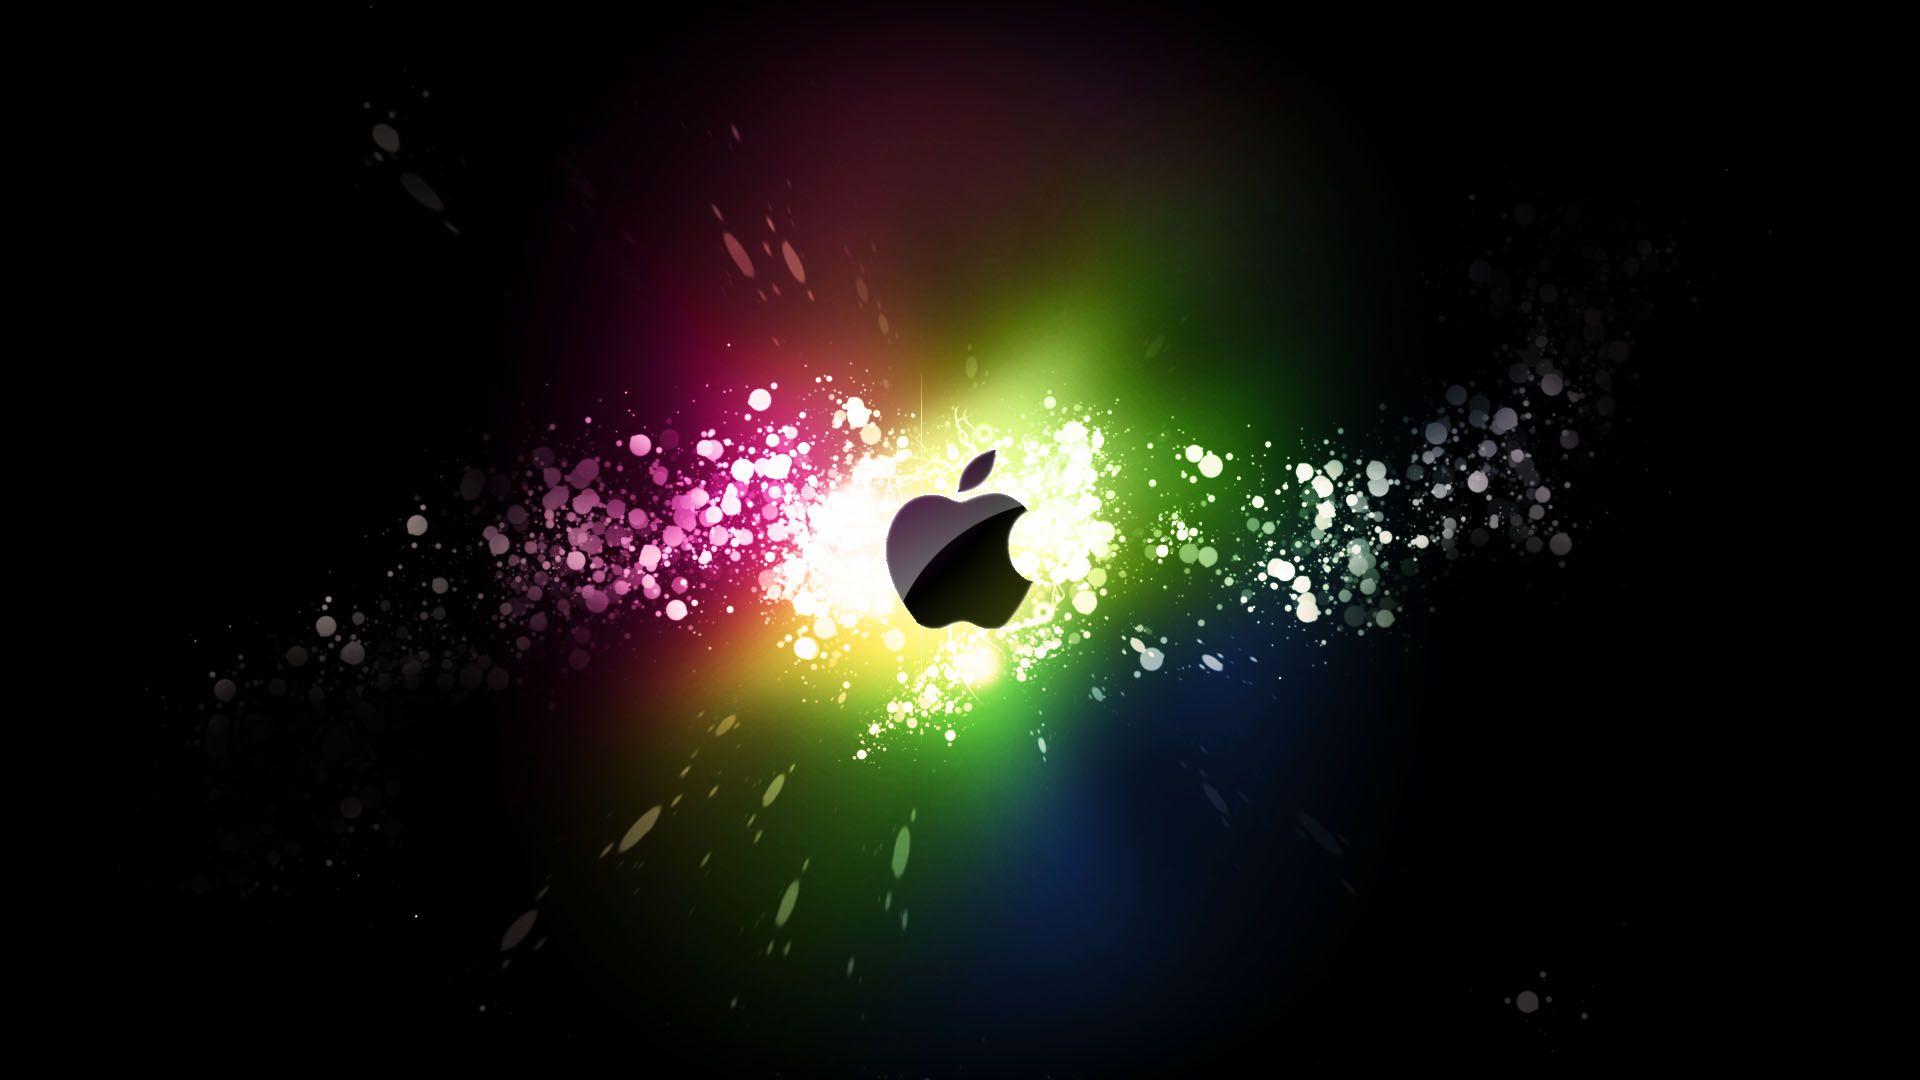 Live Wallpapers For Ipad Apple Logo Wallpaper Mac Wallpaper Hd Cool Wallpapers